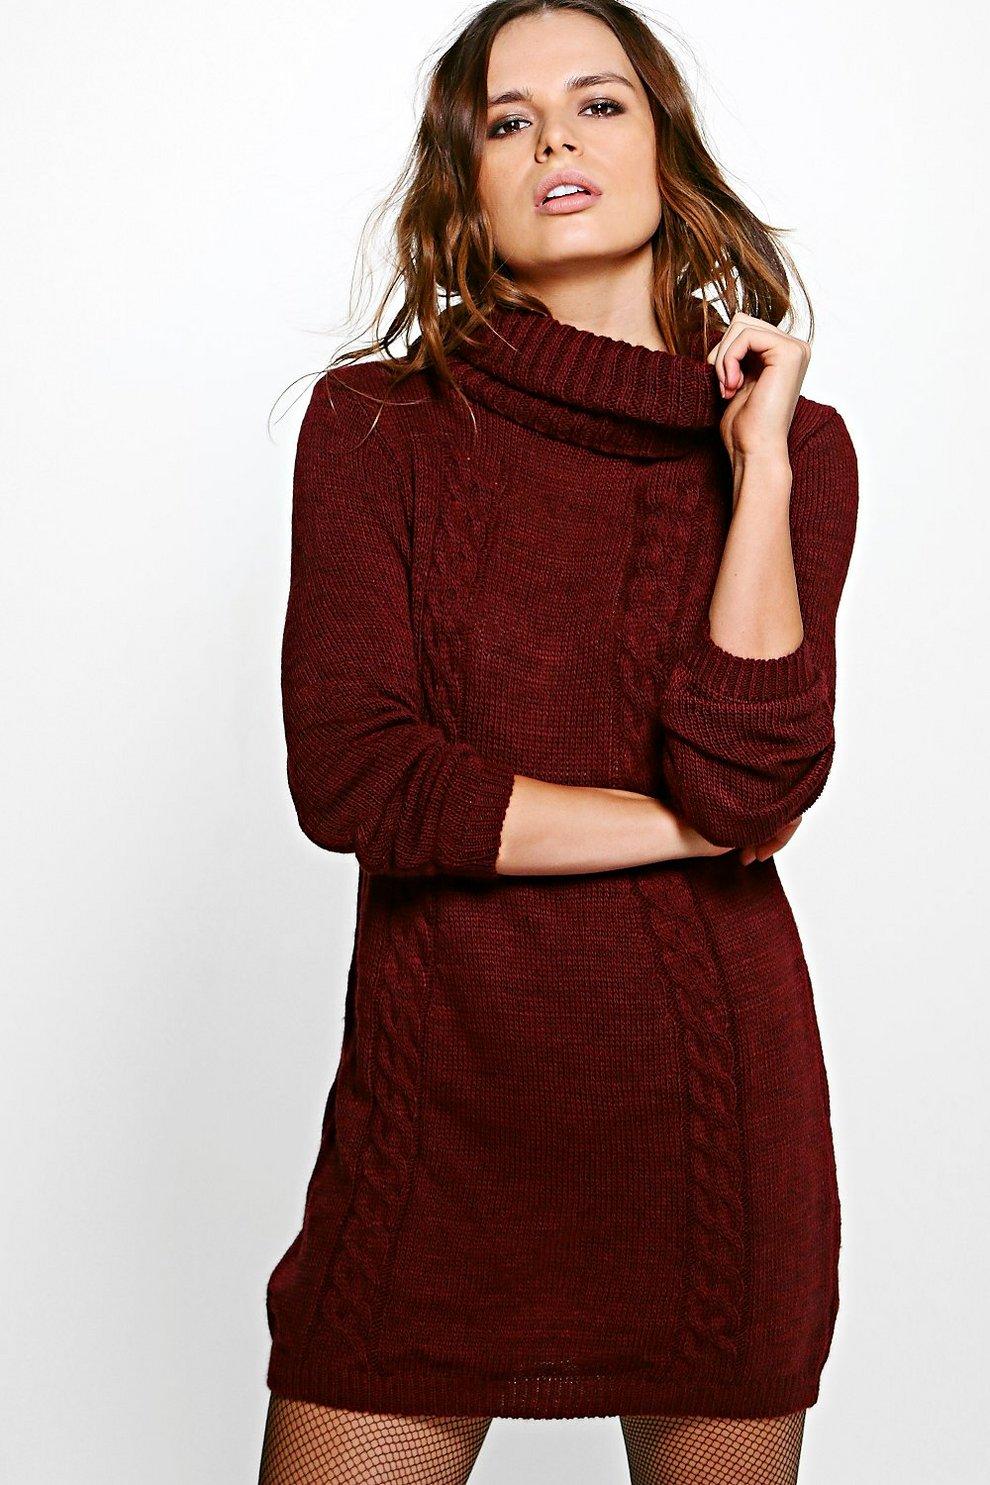 32dfc50ba6daf scarlett robe pull col roulé en tricot torsadé, Vin, Femme